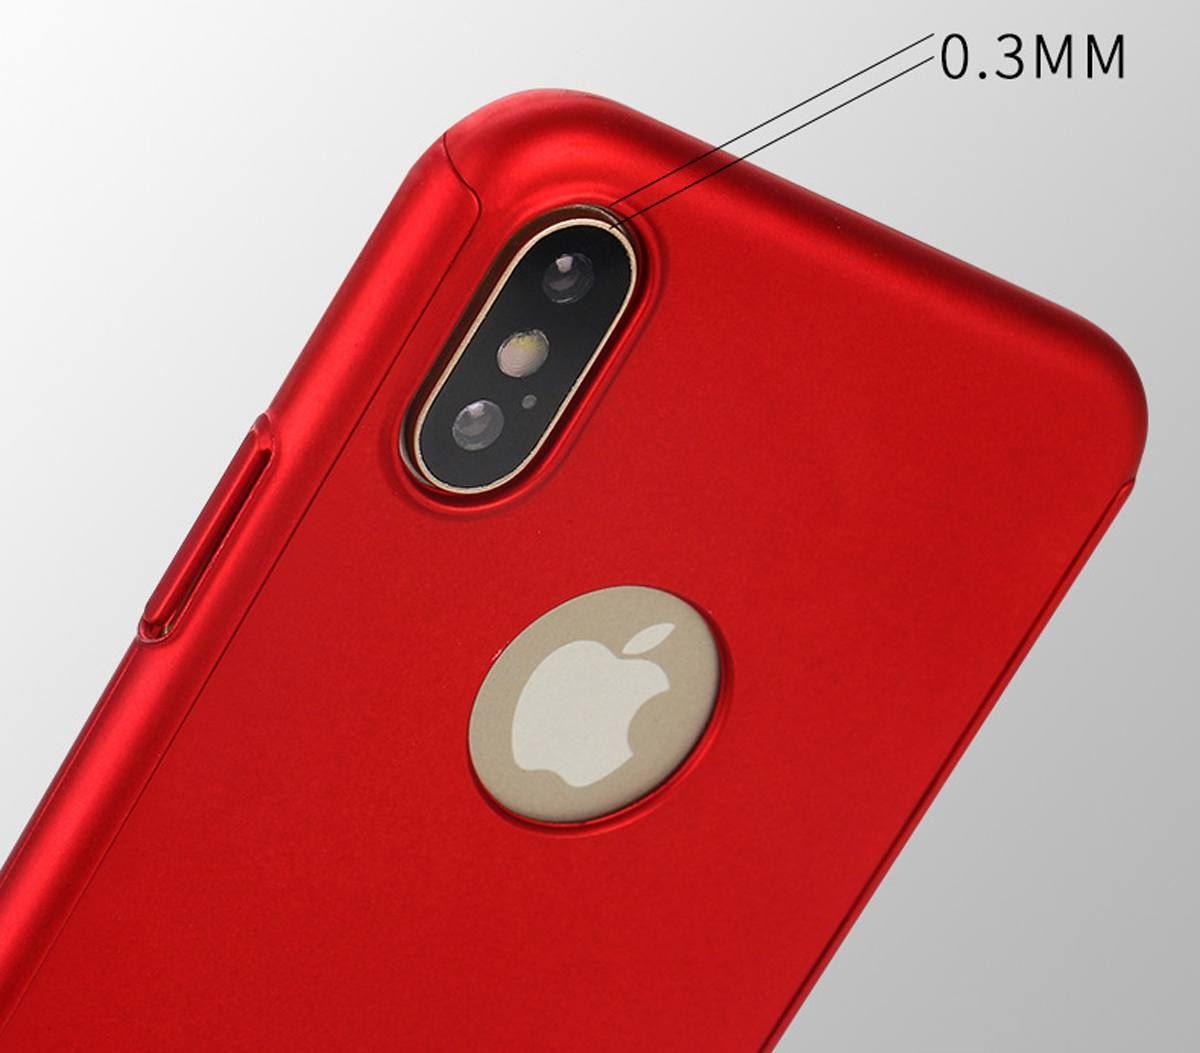 For-Apple-iPhone-XS-Max-XR-Hybrid-360-Slim-Ultra-Thin-Heavy-Duty-Shockproof-Case Indexbild 61